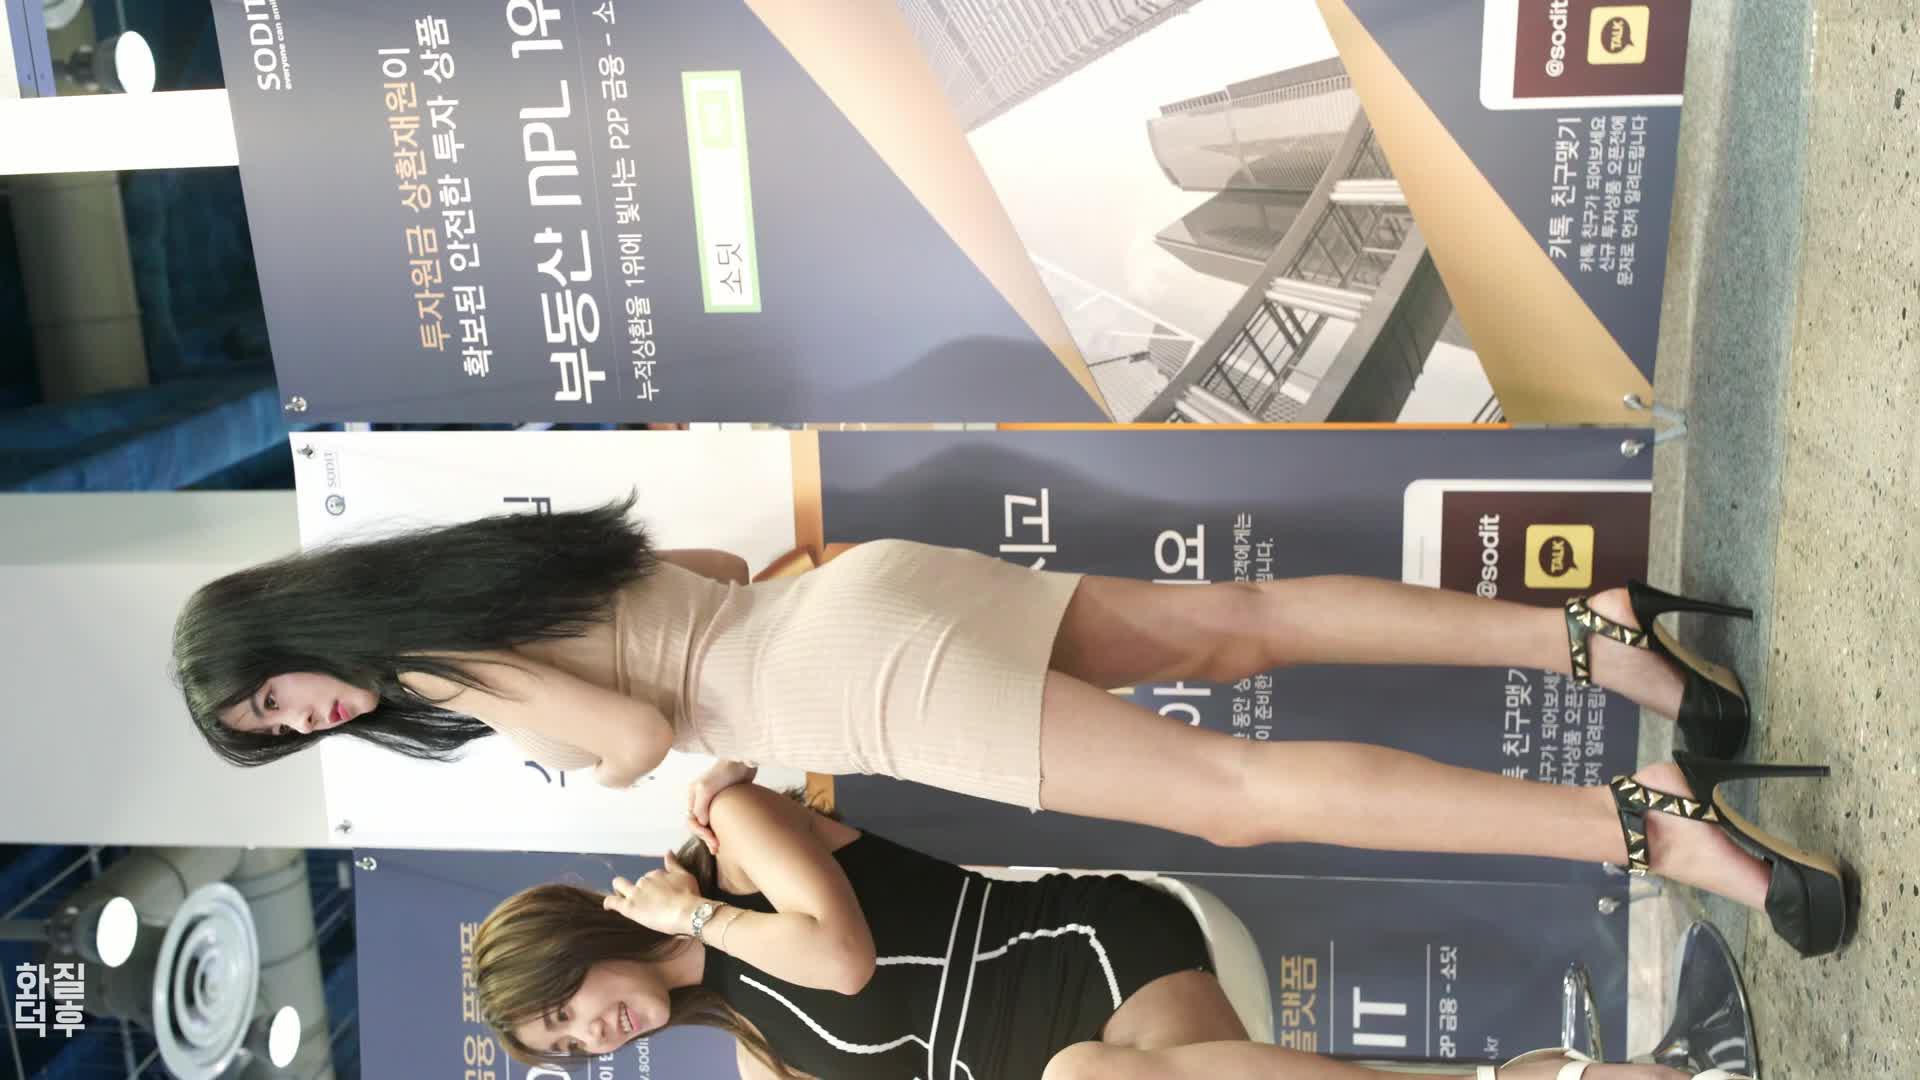 4K 심지영 Shim Jiyeong 반지희 Ban Jihui #5 1 가로 직캠 Horizontal Fancam 2017 서울머니쇼 by 화질덕후 4kOTAKU